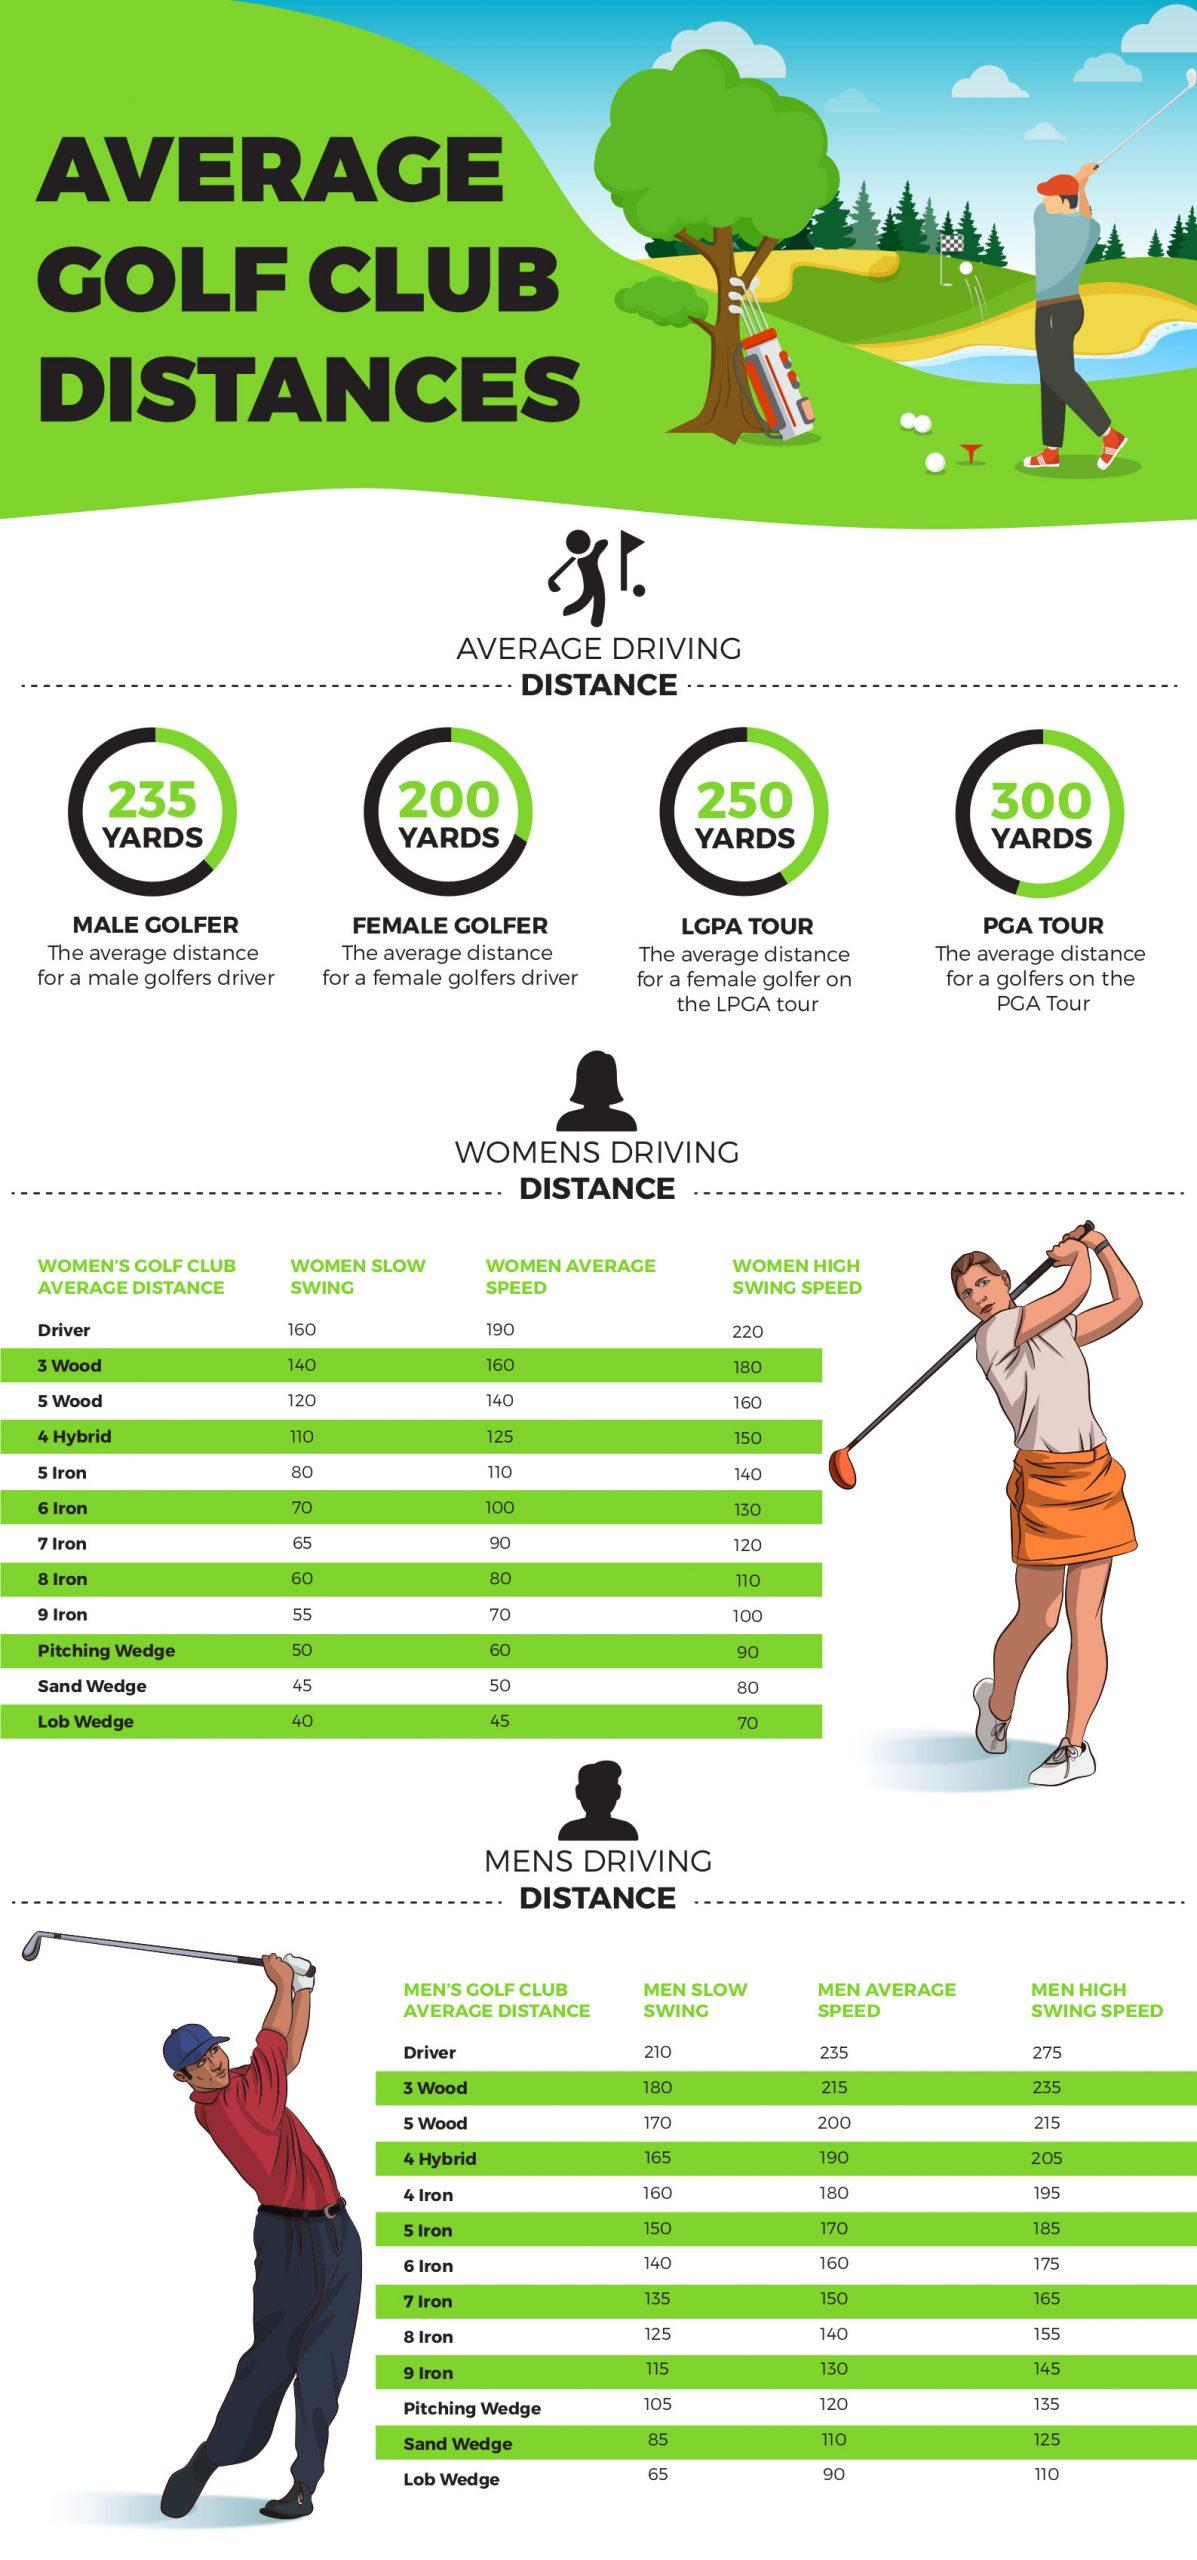 Average golf club distances